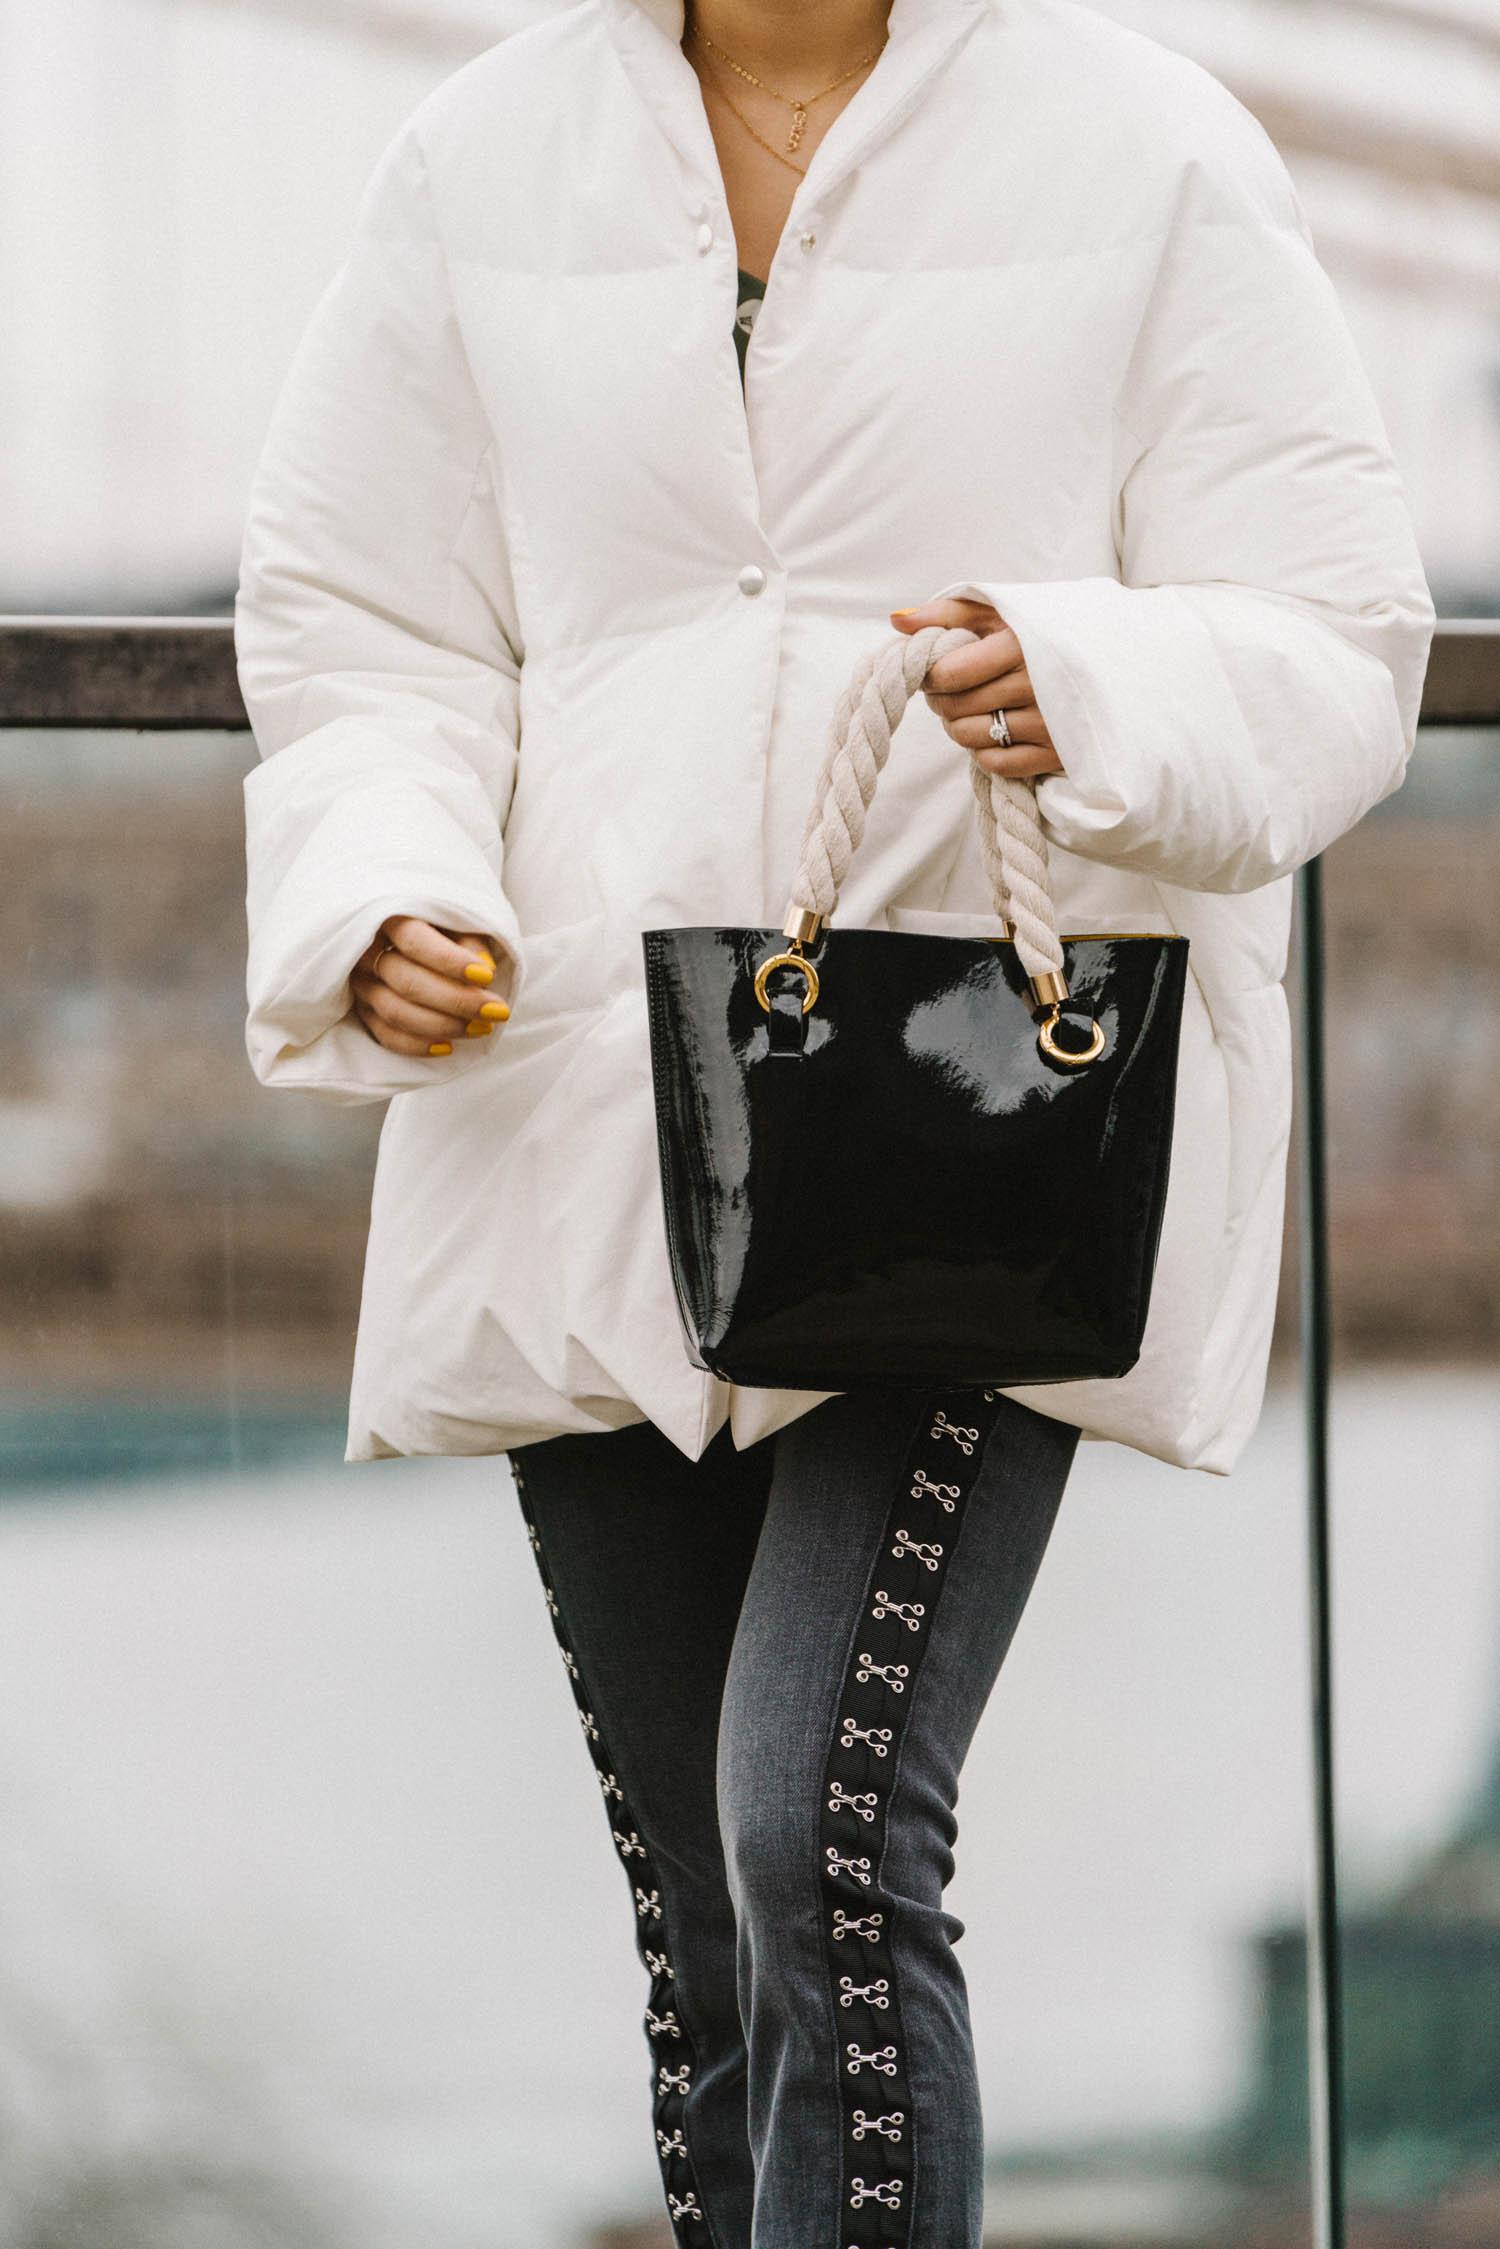 Jil Sander Coat ,  Petite Studio Top ,  3x1 Denim ,  Janis Studios Bag , Louis Vuitton Necklace, Atelier Paulin Necklace, WWAKE Earrings